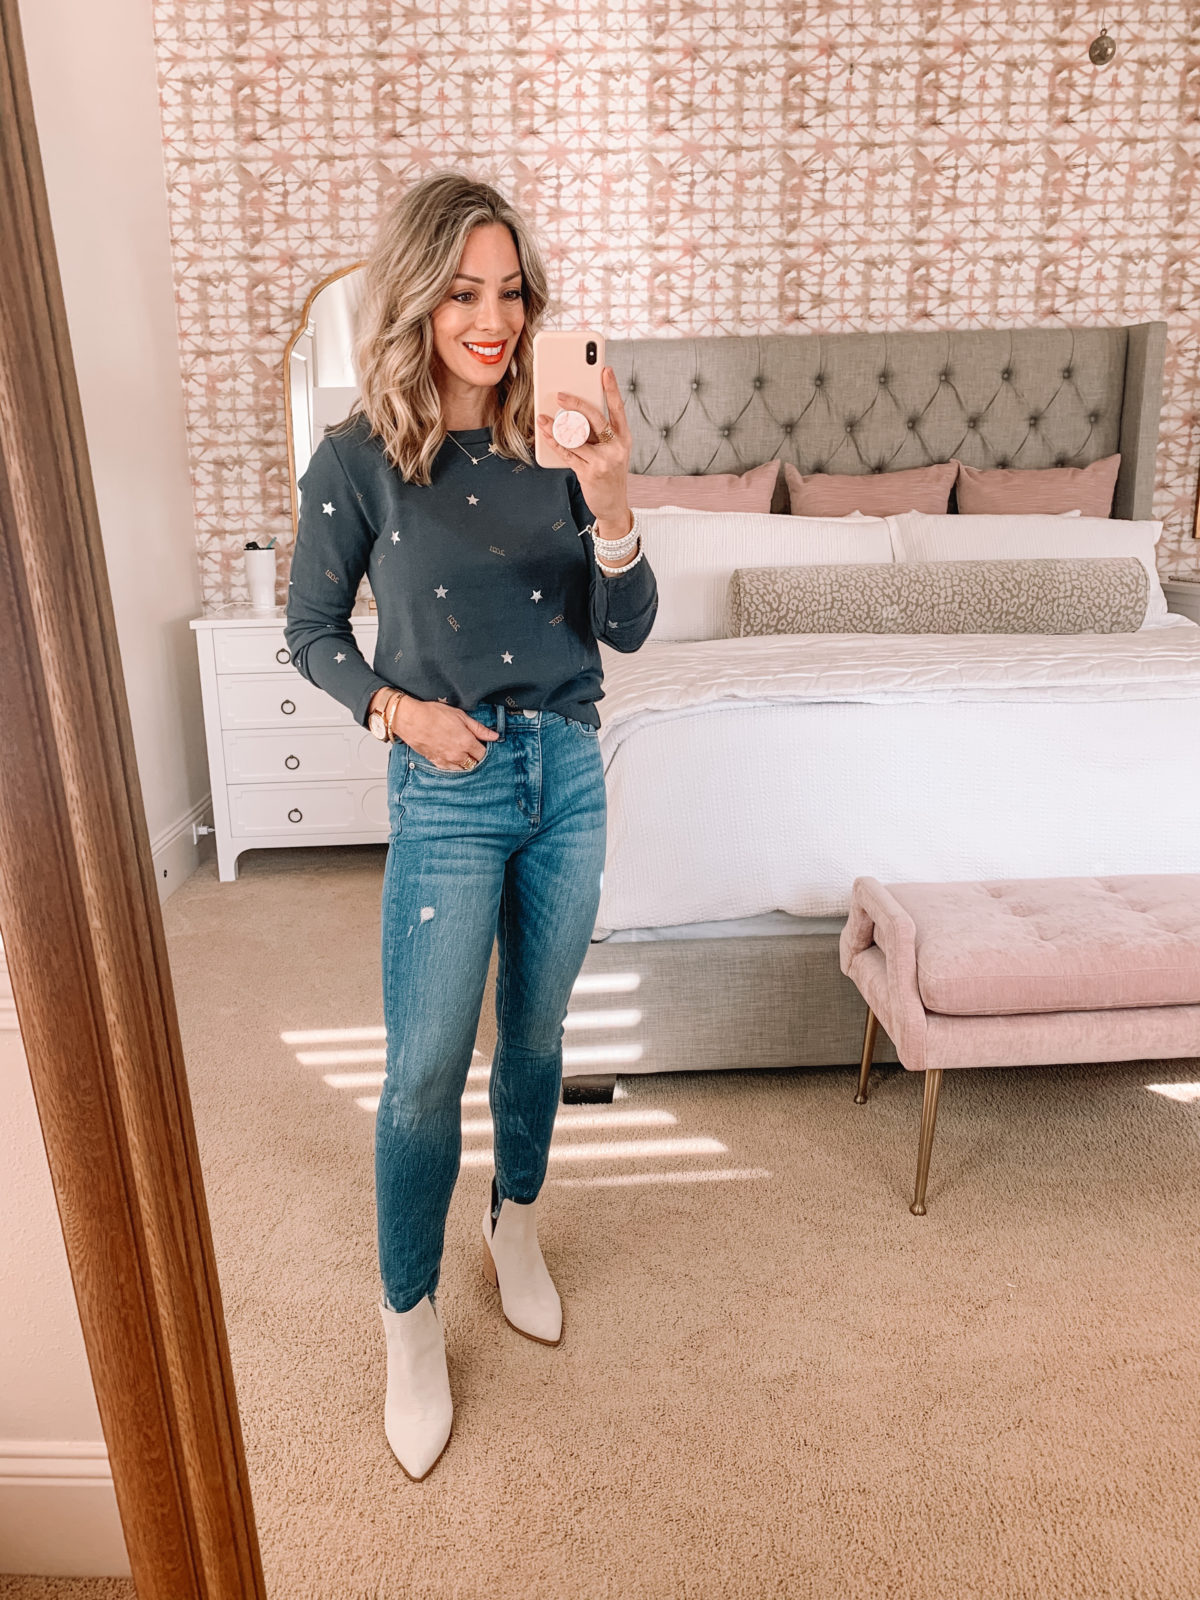 Dressing Room Try On LOFT, NYE Tee, Jeans, Booties